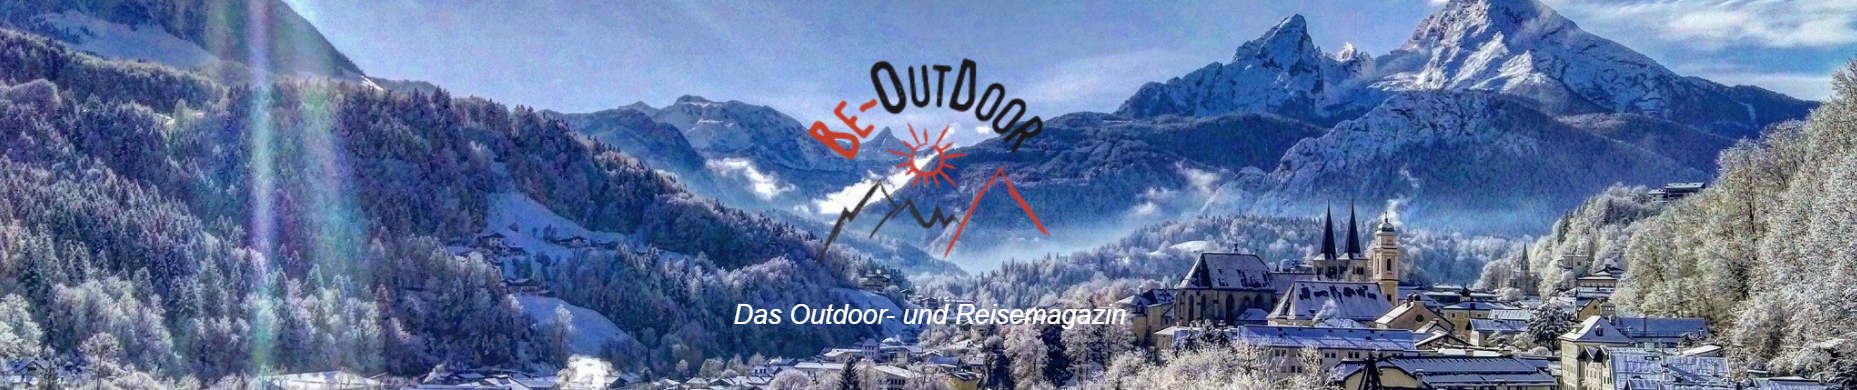 Titelbild_Newsletter_be-outdoor.de